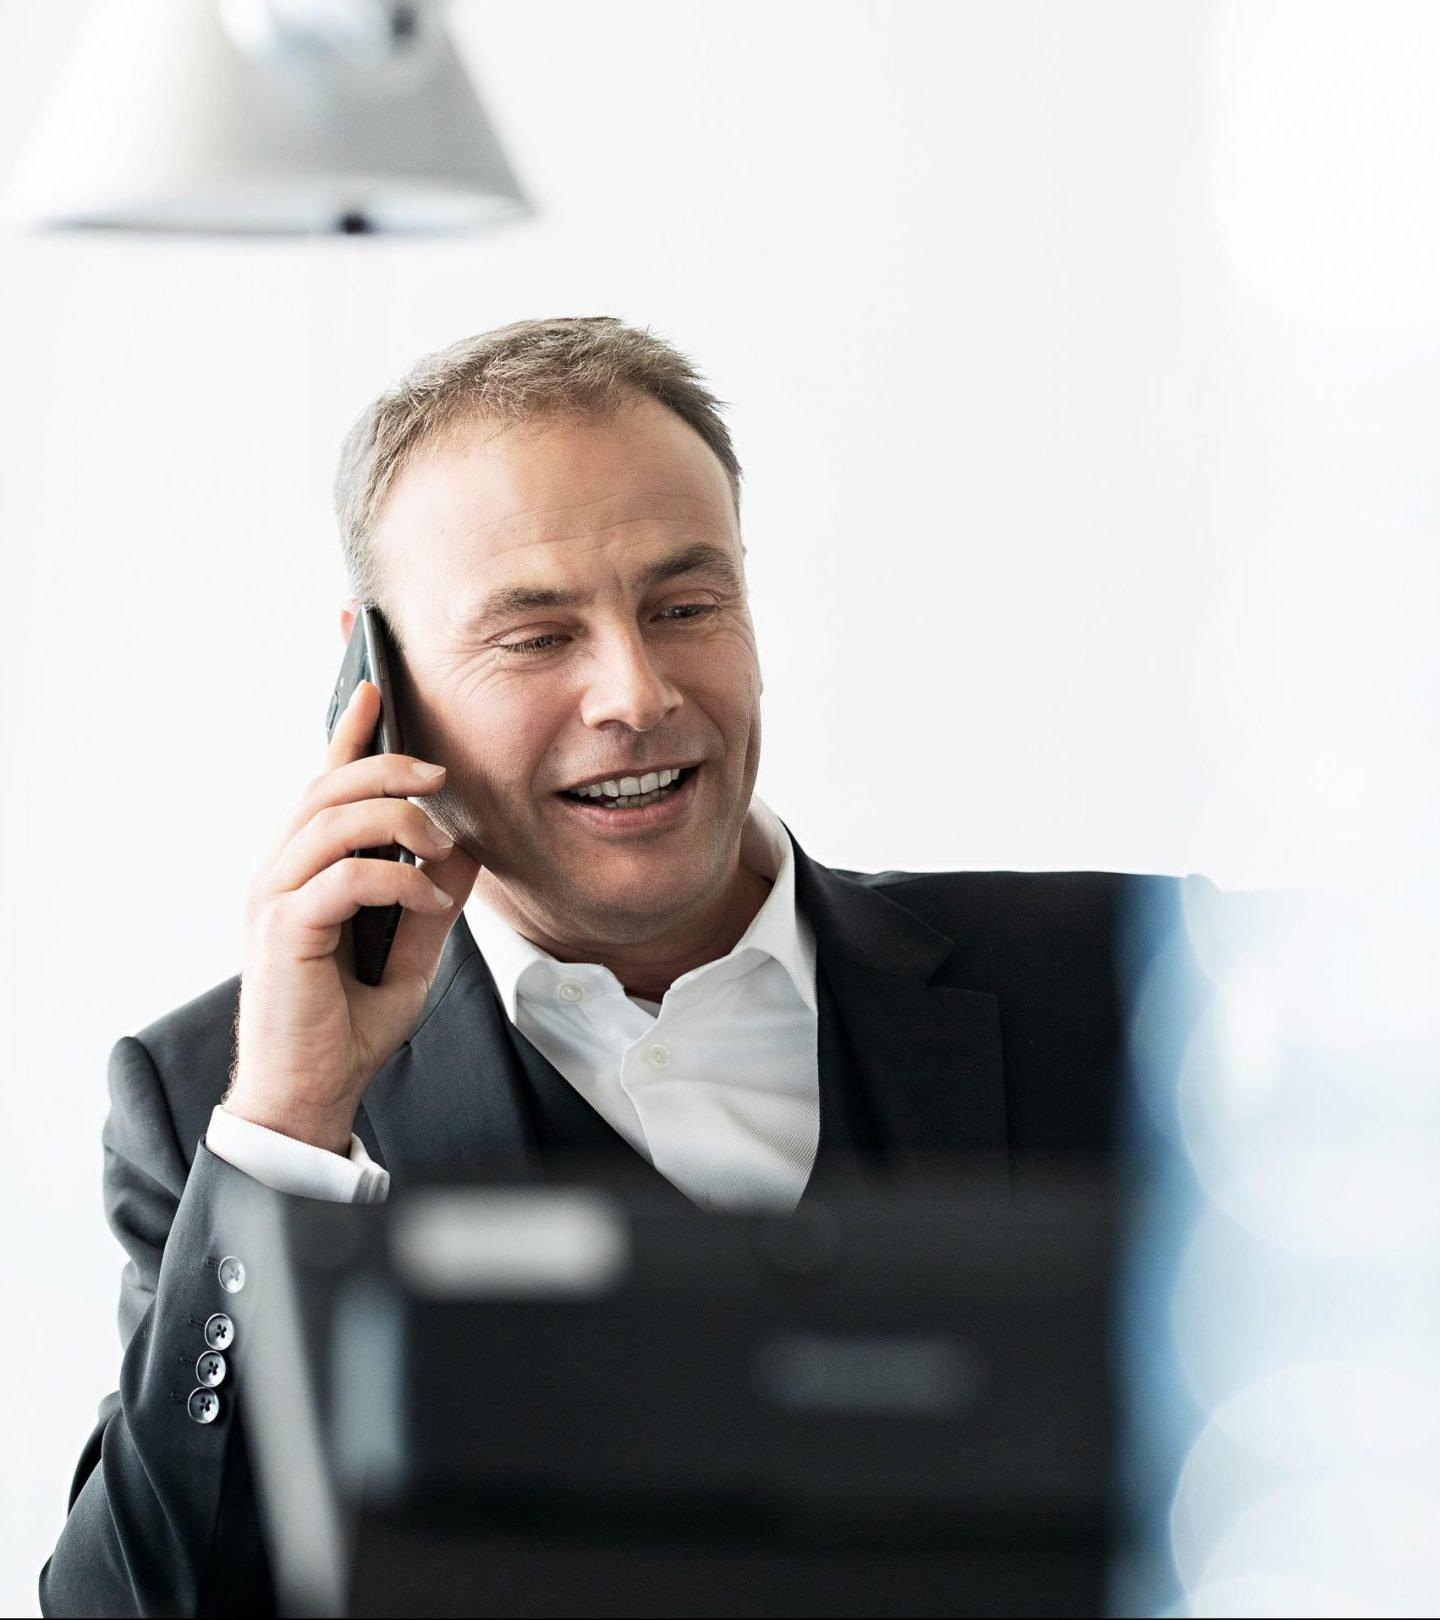 Paribus-Mitarbeiter am Telefon